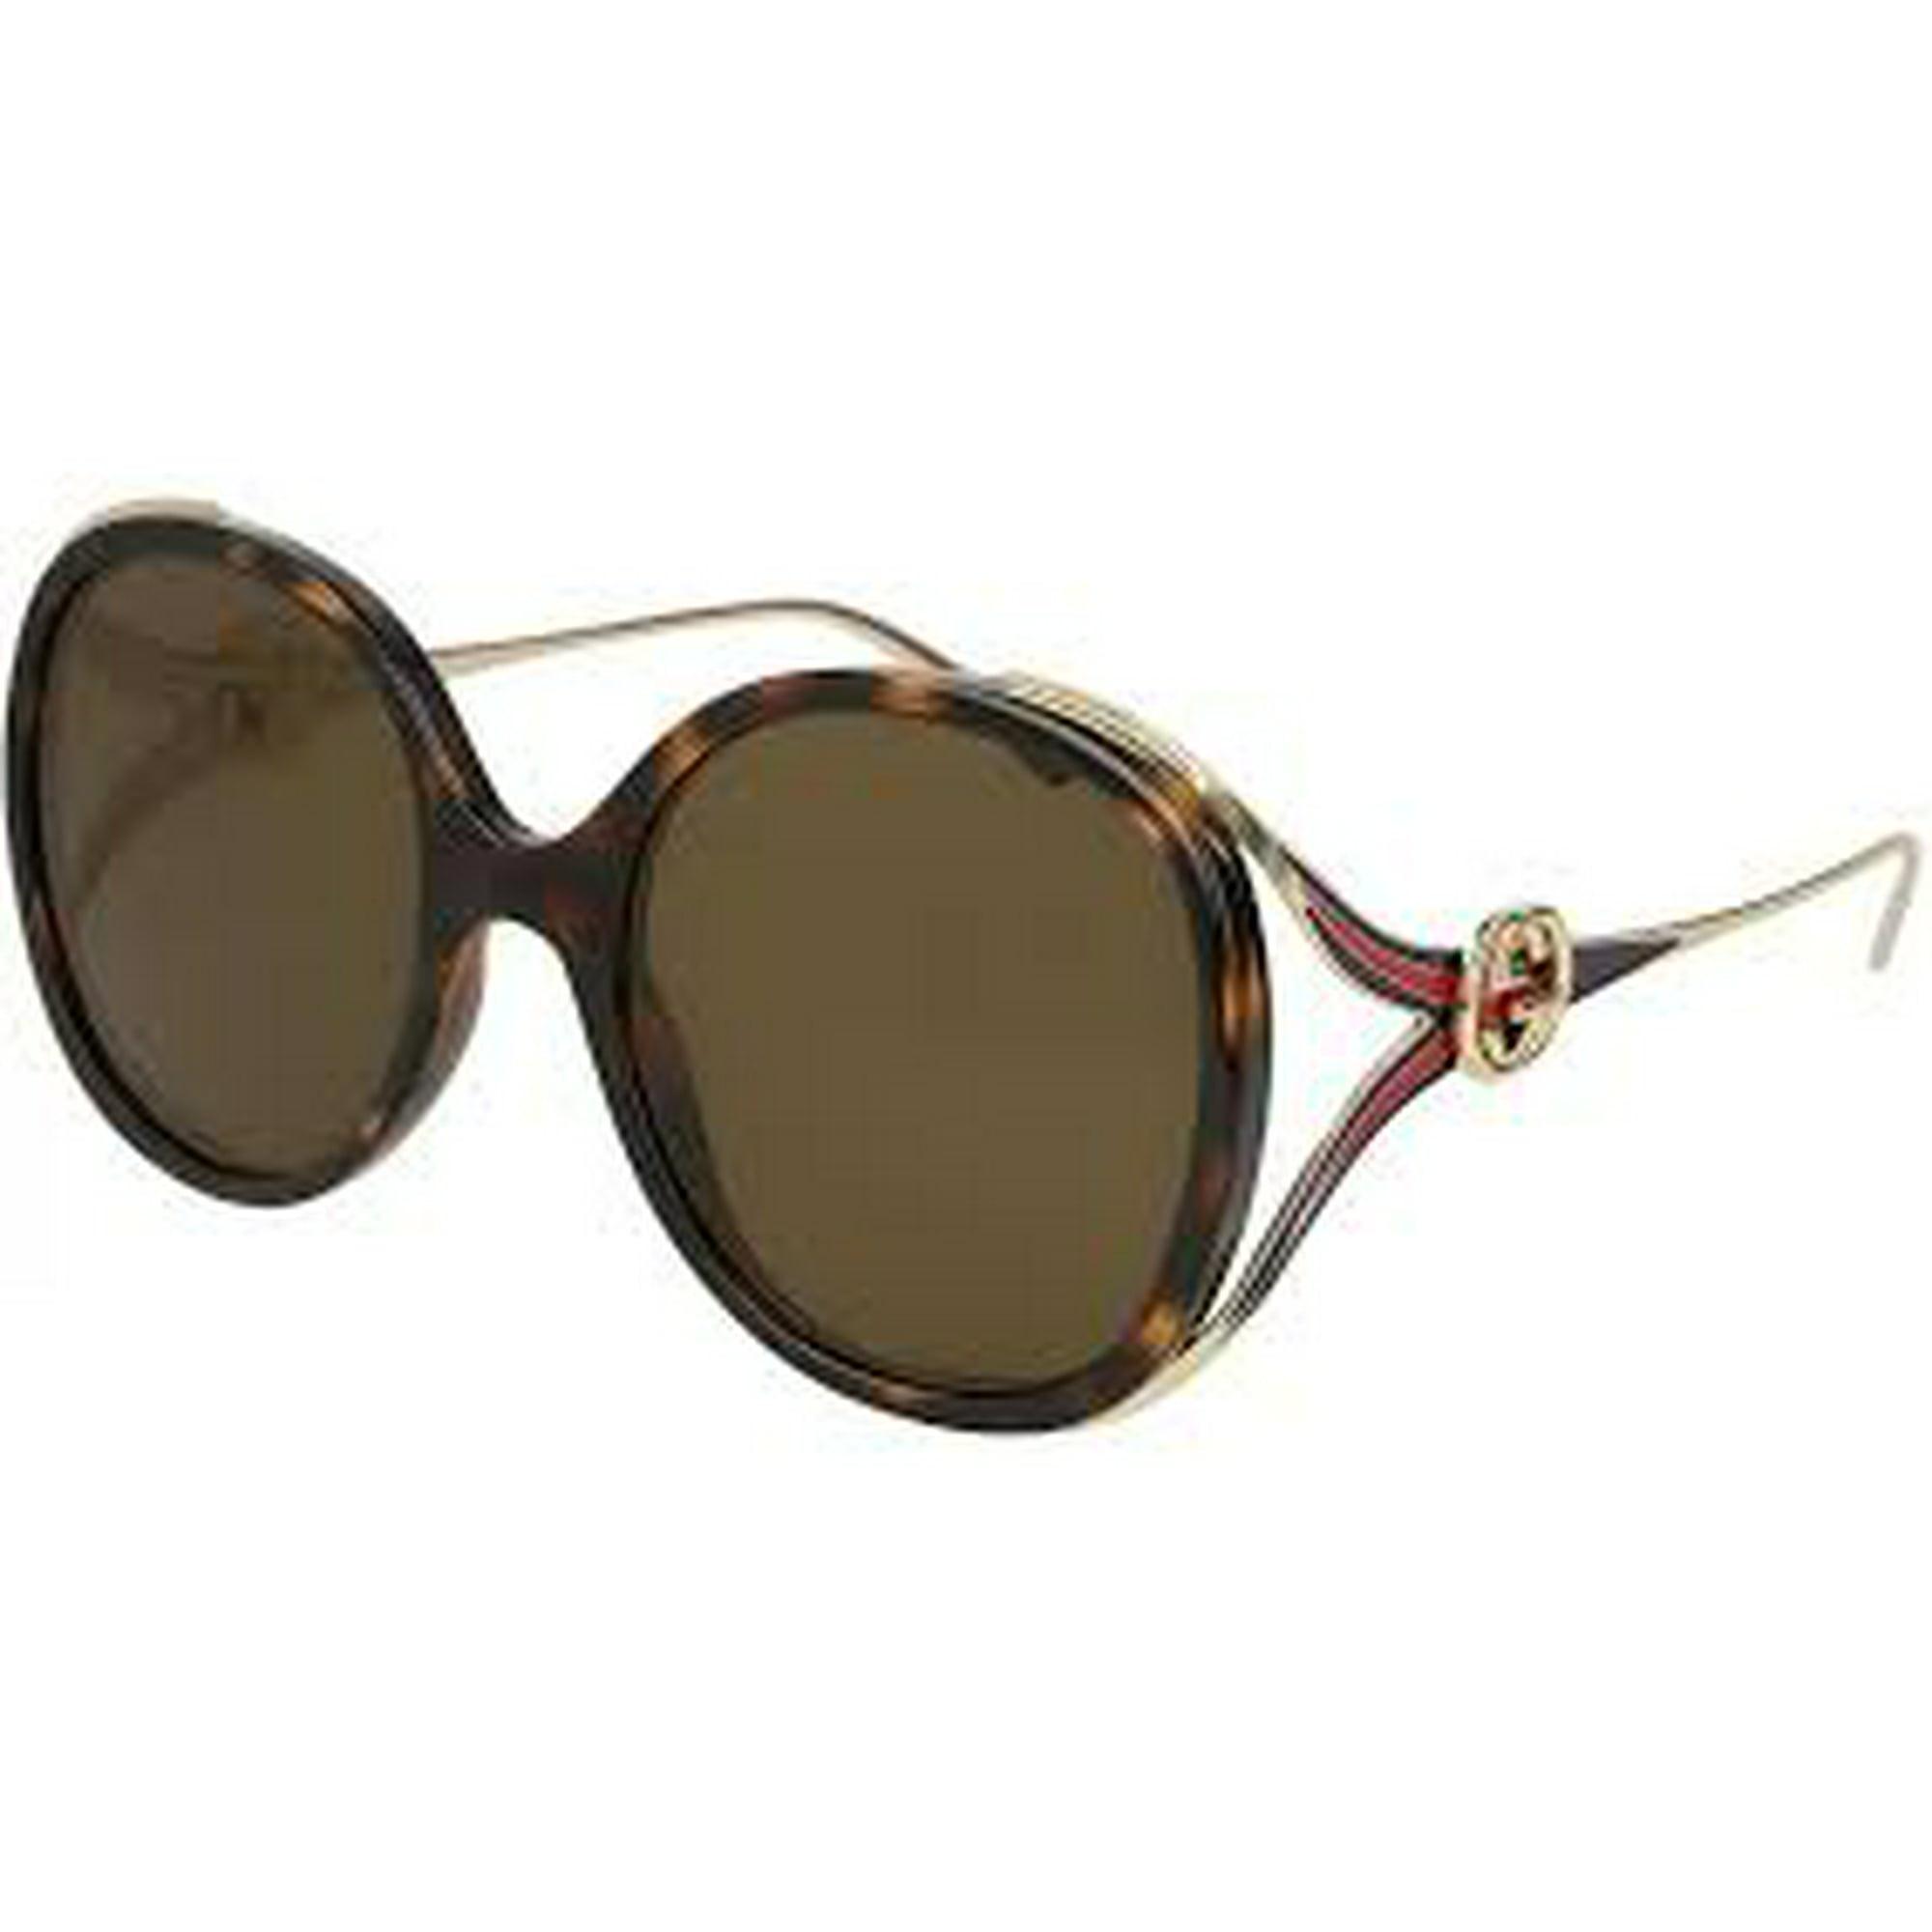 d5cfaf36c65 Gucci Brown Round Sunglasses GG0226S 002 56